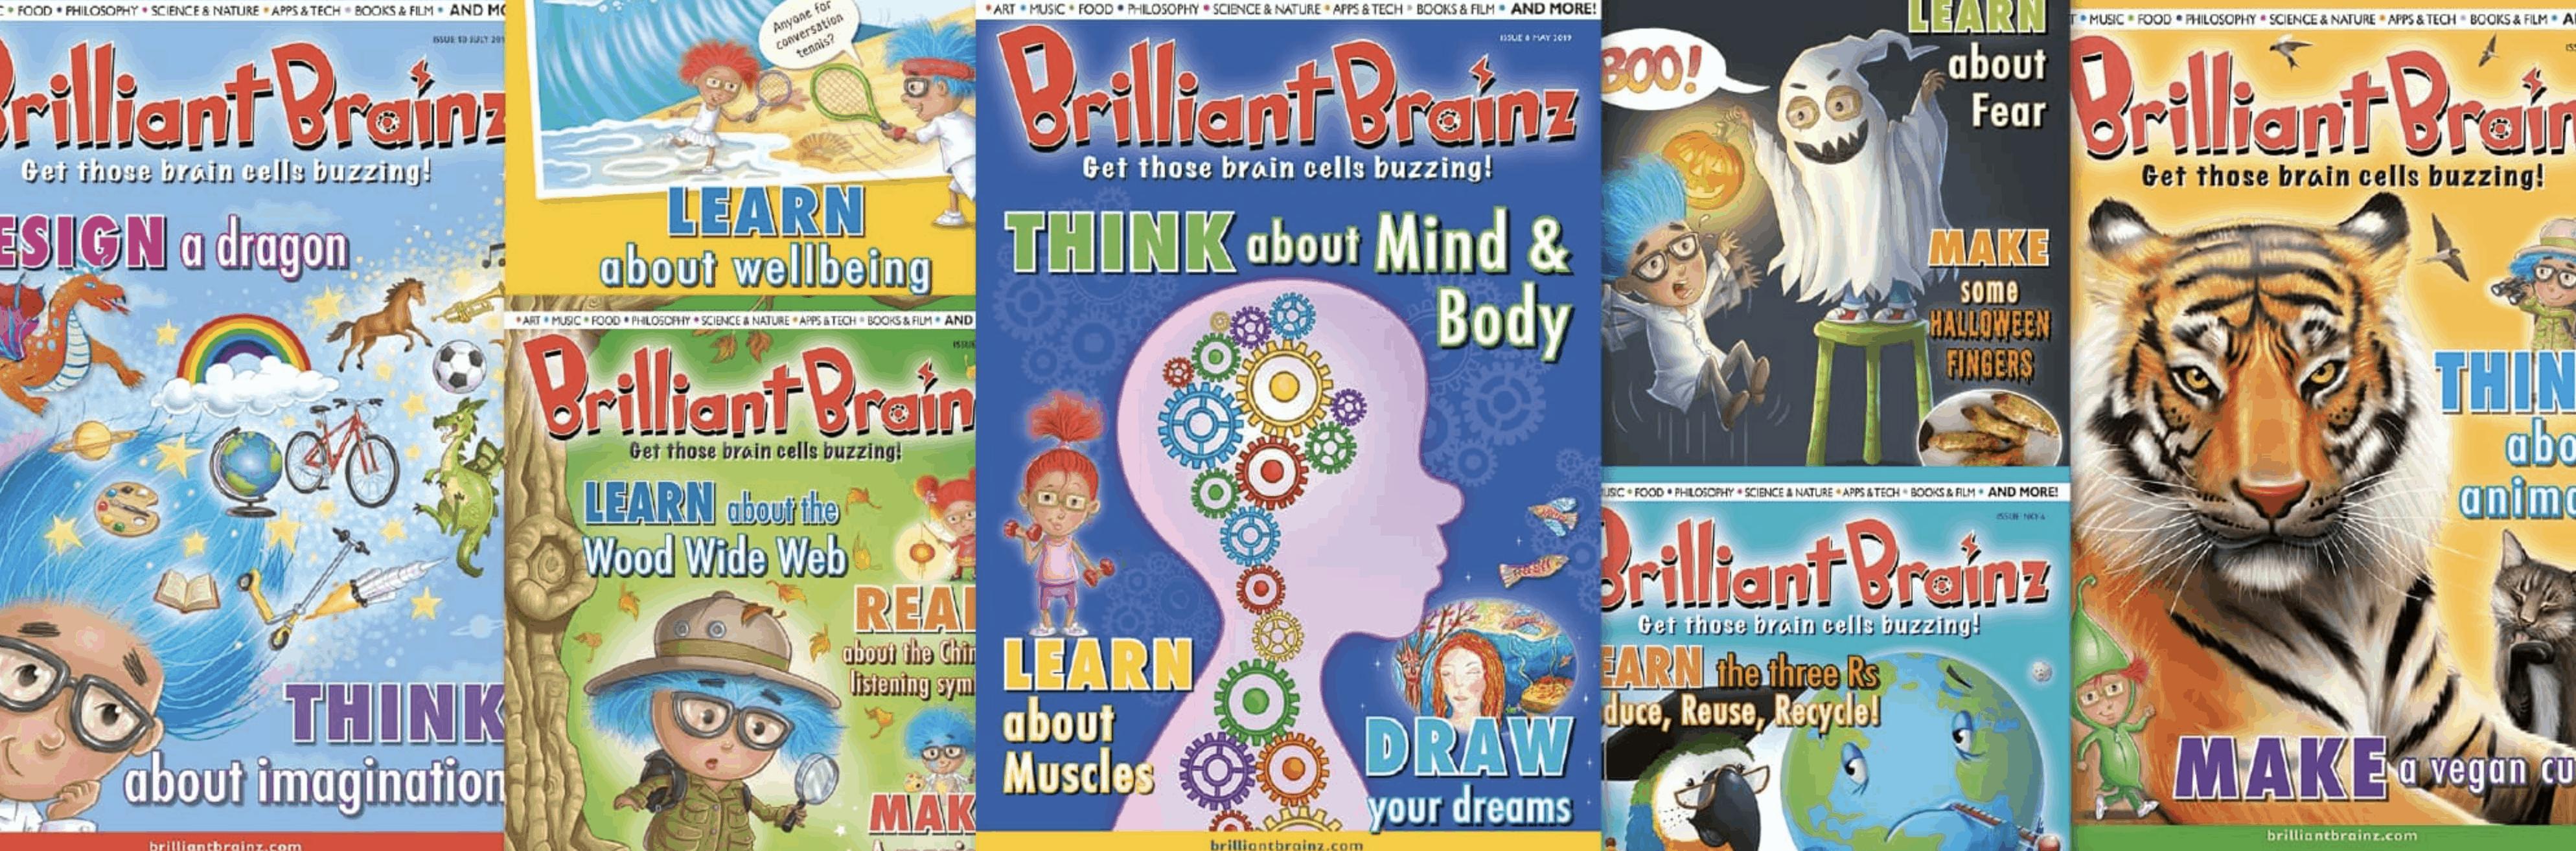 Brilliant Brainz Magazines